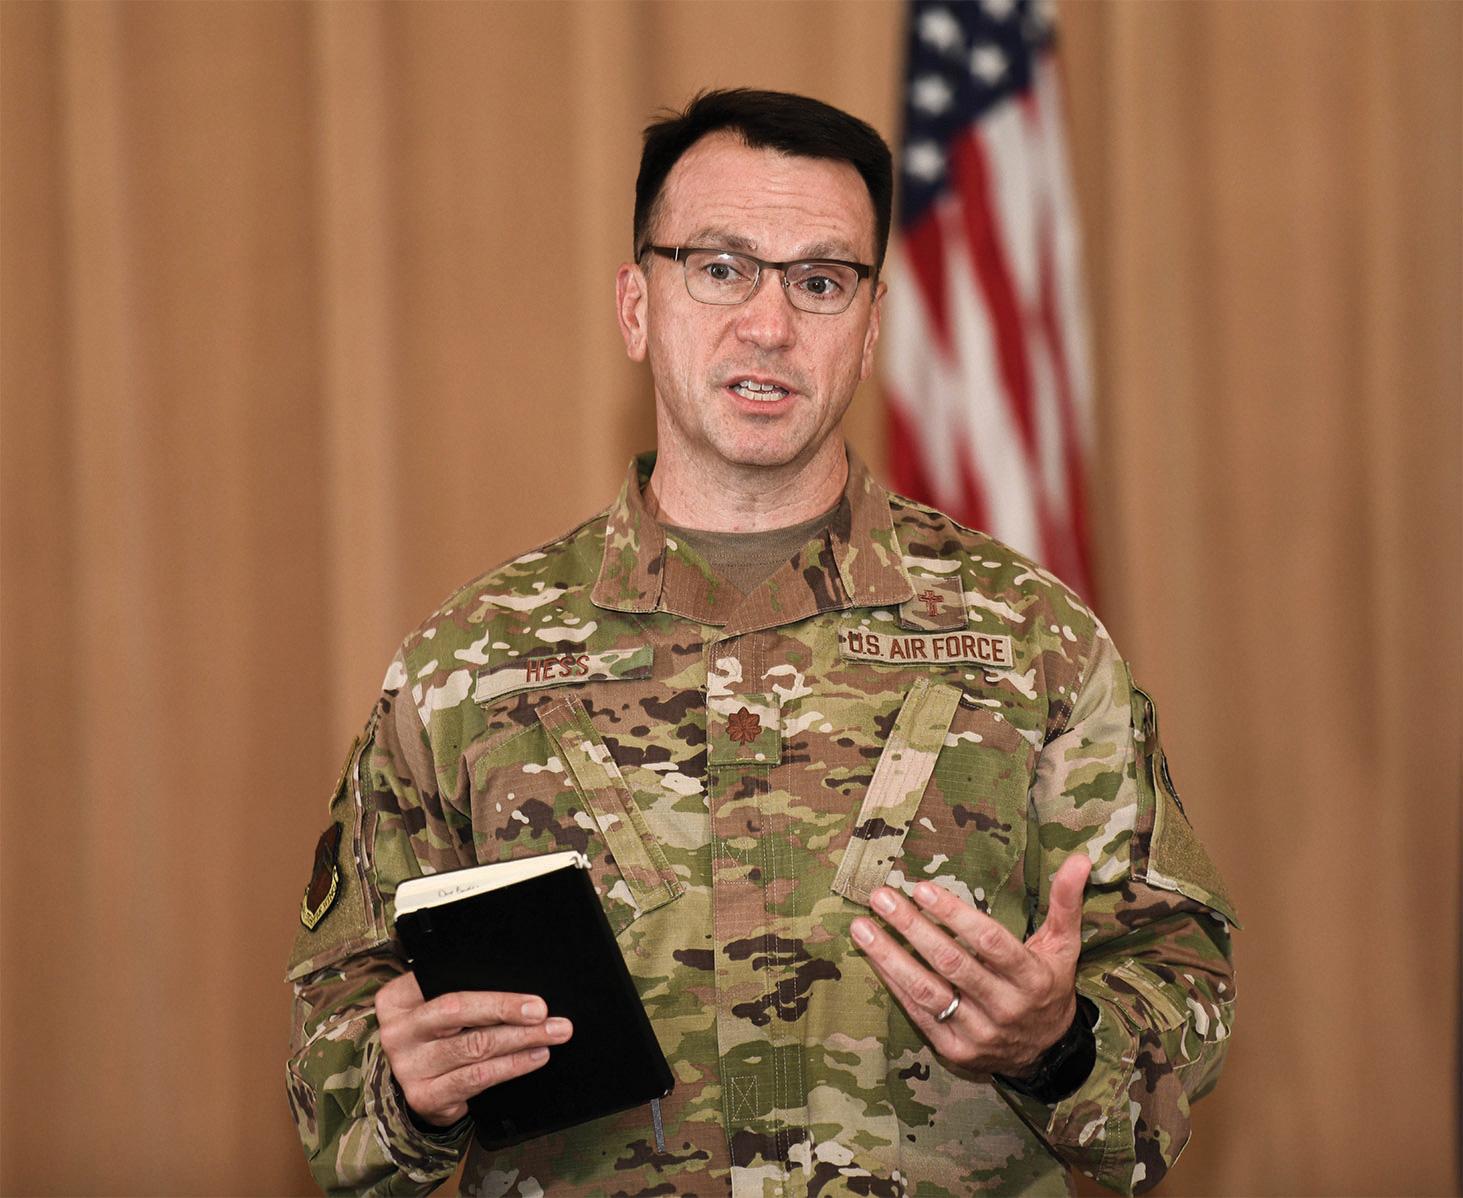 Chaplain Major Douglas O. Hess